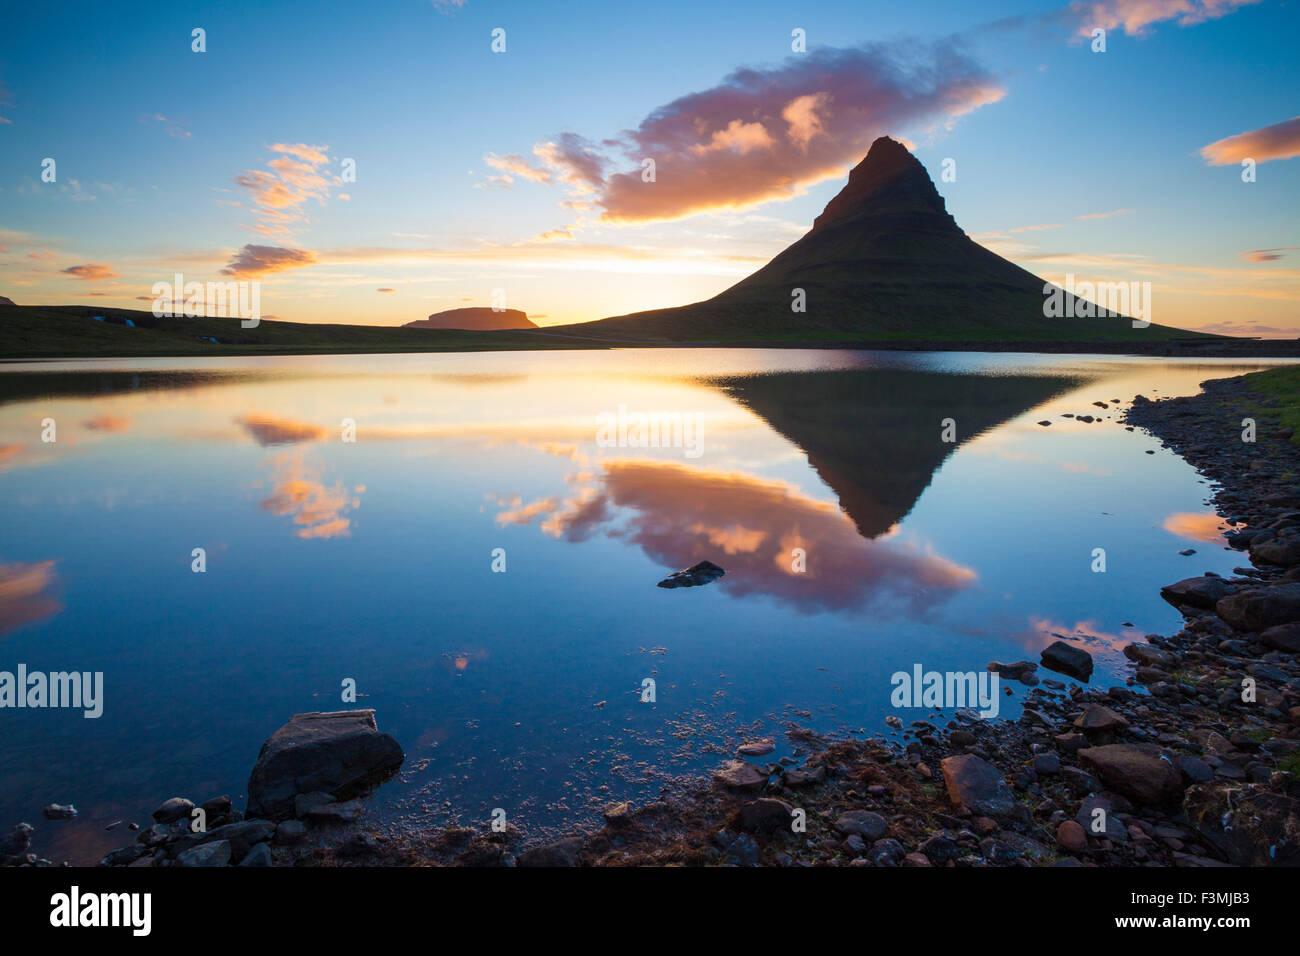 Sonnenuntergang Reflexion des Kirkjufell Berg, Grundarfjordur, Snaefellsnes Halbinsel, Vesturland, Island. Stockbild